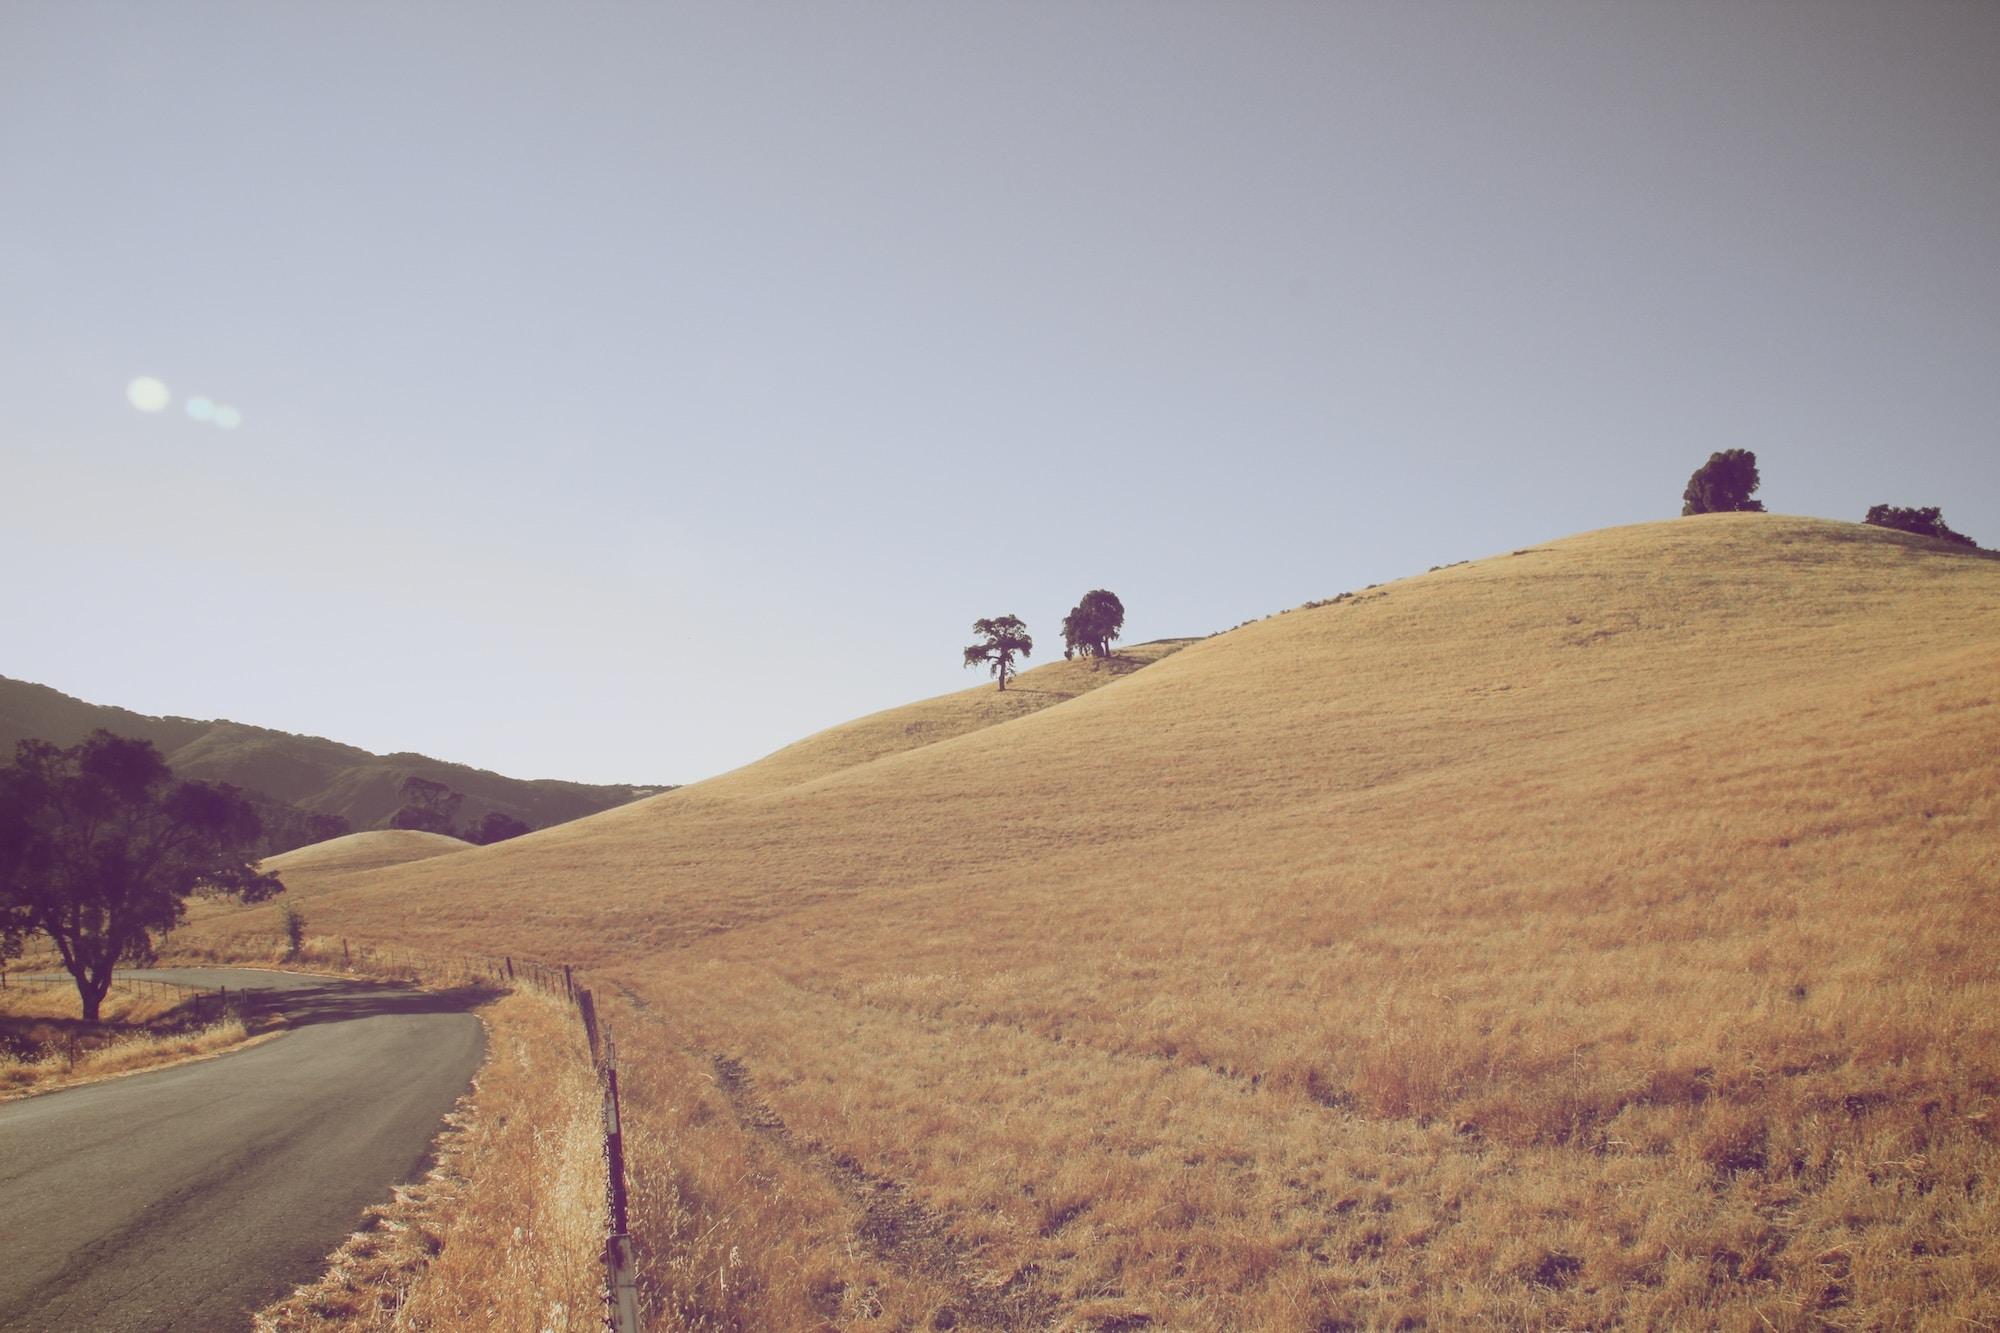 Barren country hillside next to a rural road